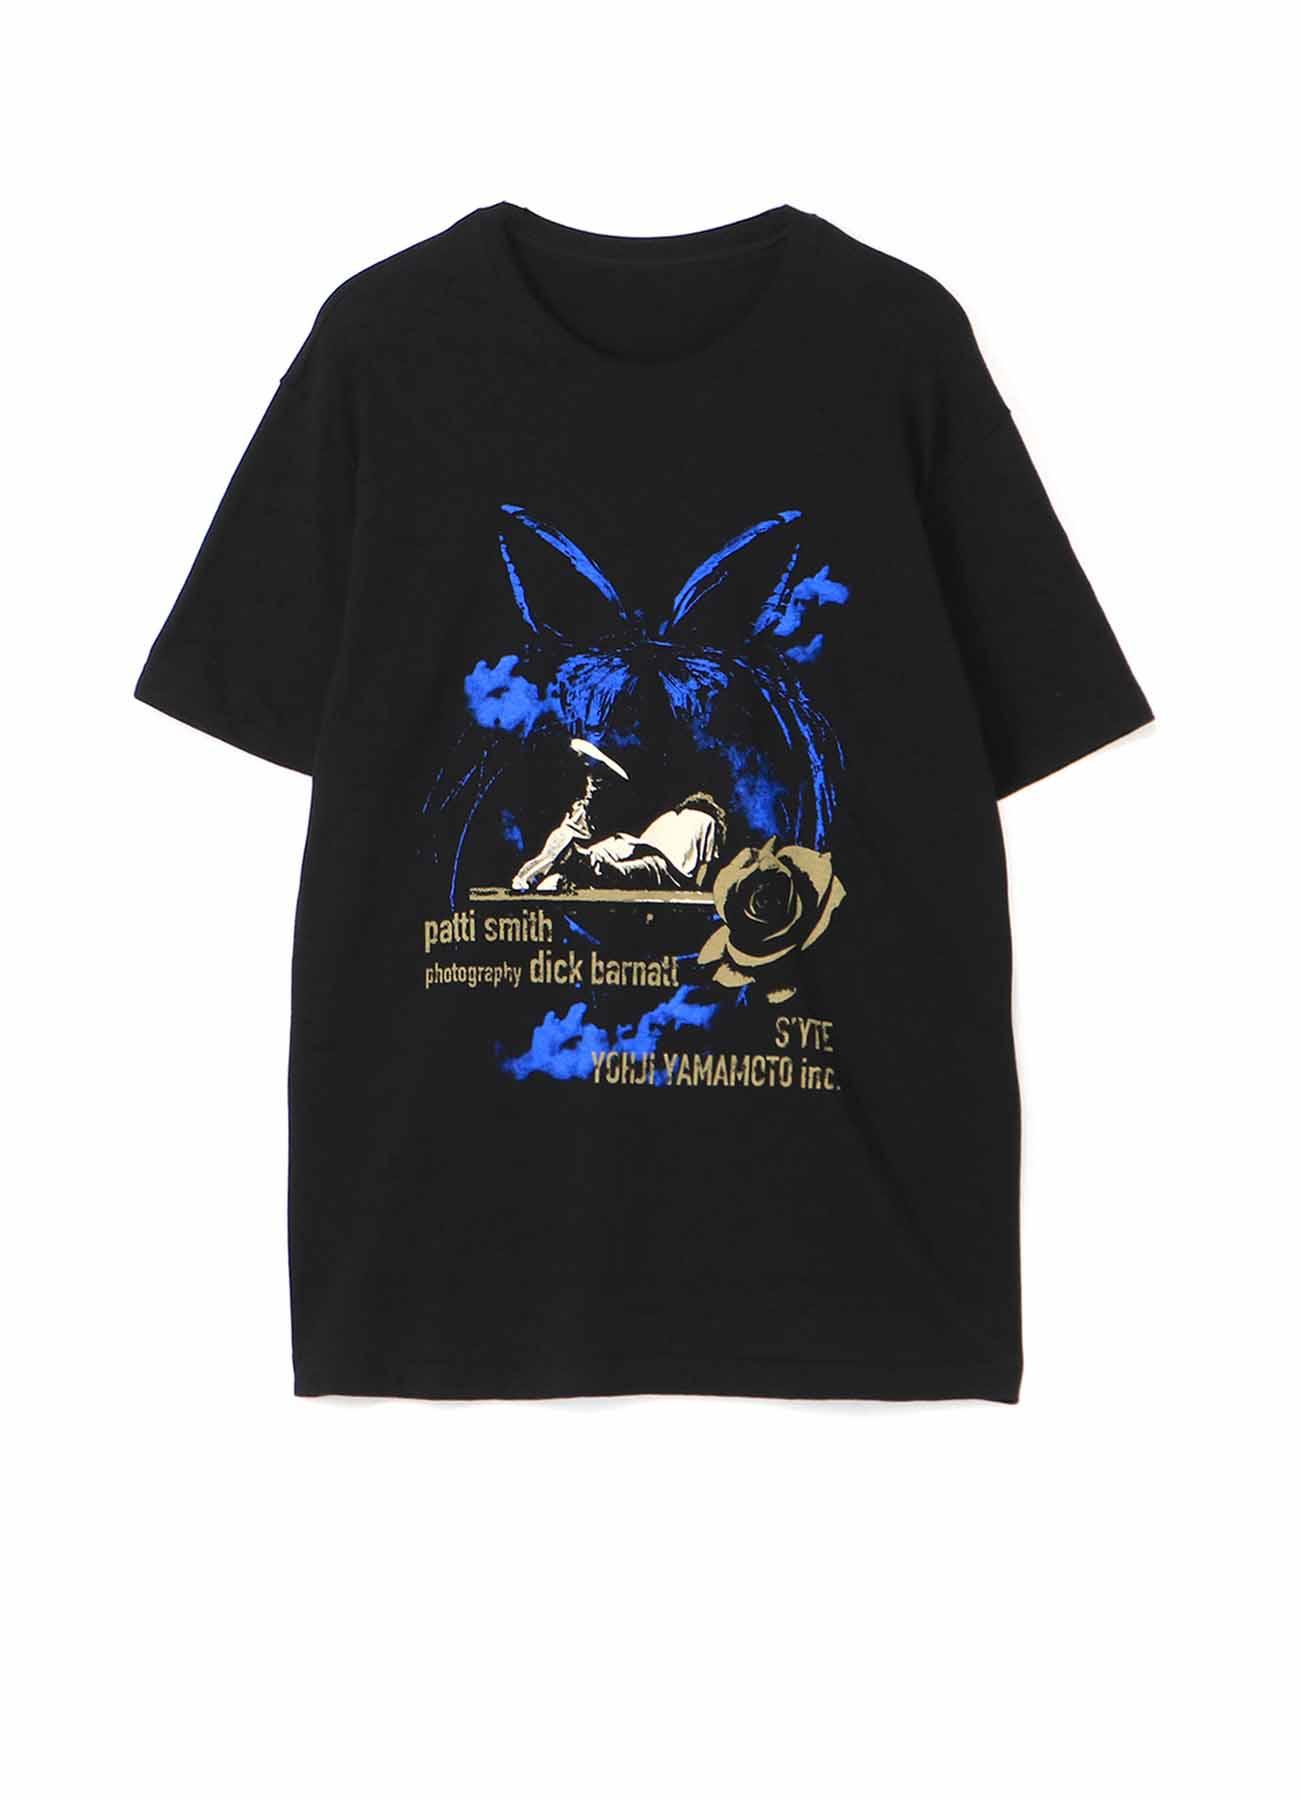 S'YTE × Dick Barnatt / Patti Smith T-shirt